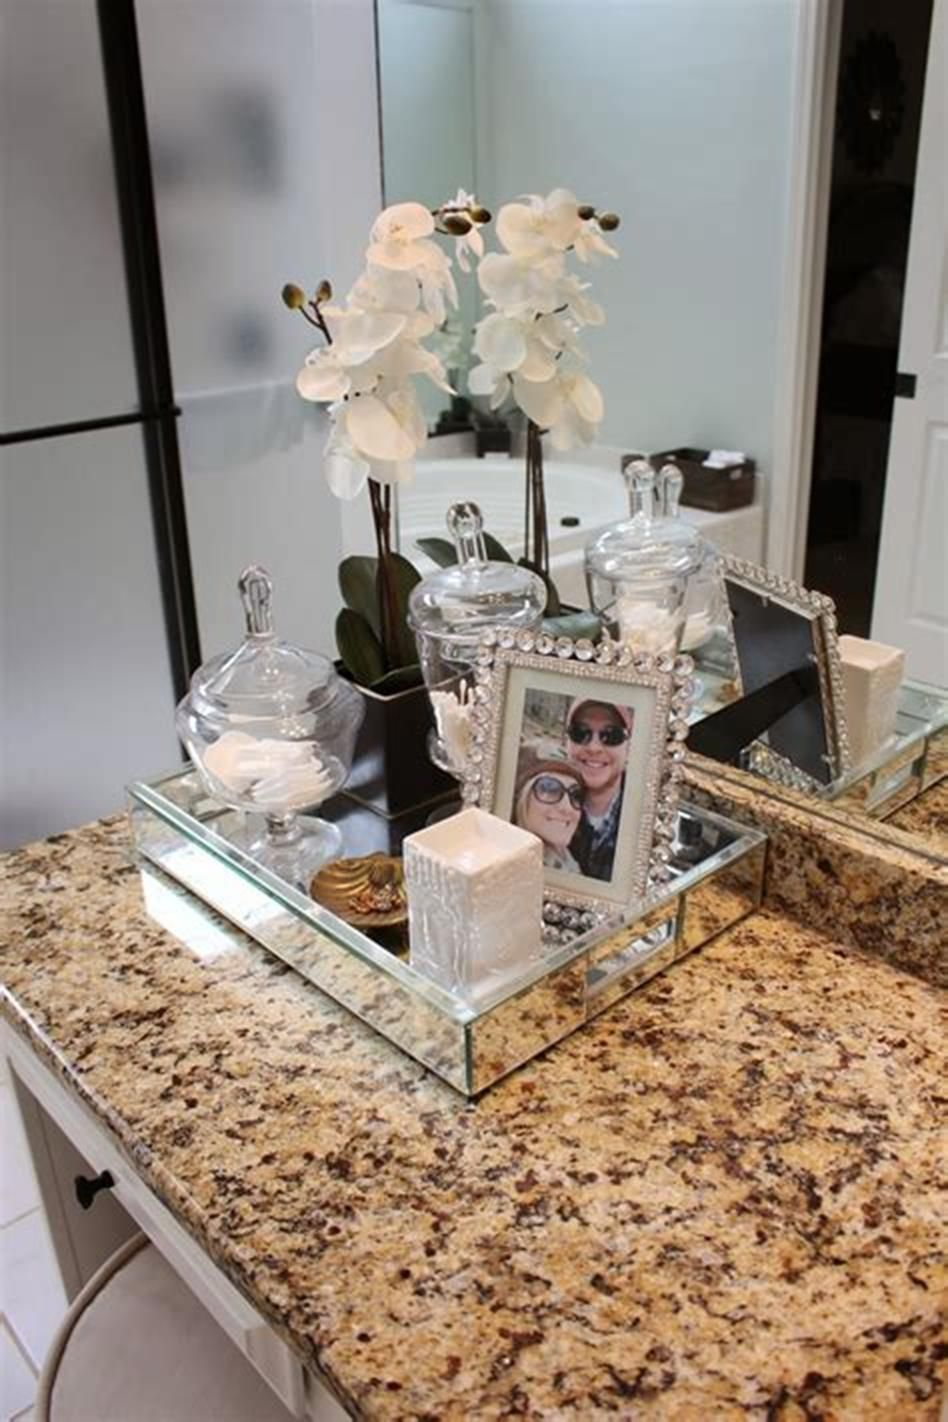 40 Beautiful Bathroom Vanity Tray Decor Ideas 5 Bathroom Counter Decor Bathroom Spa Diy Bathroom Decor